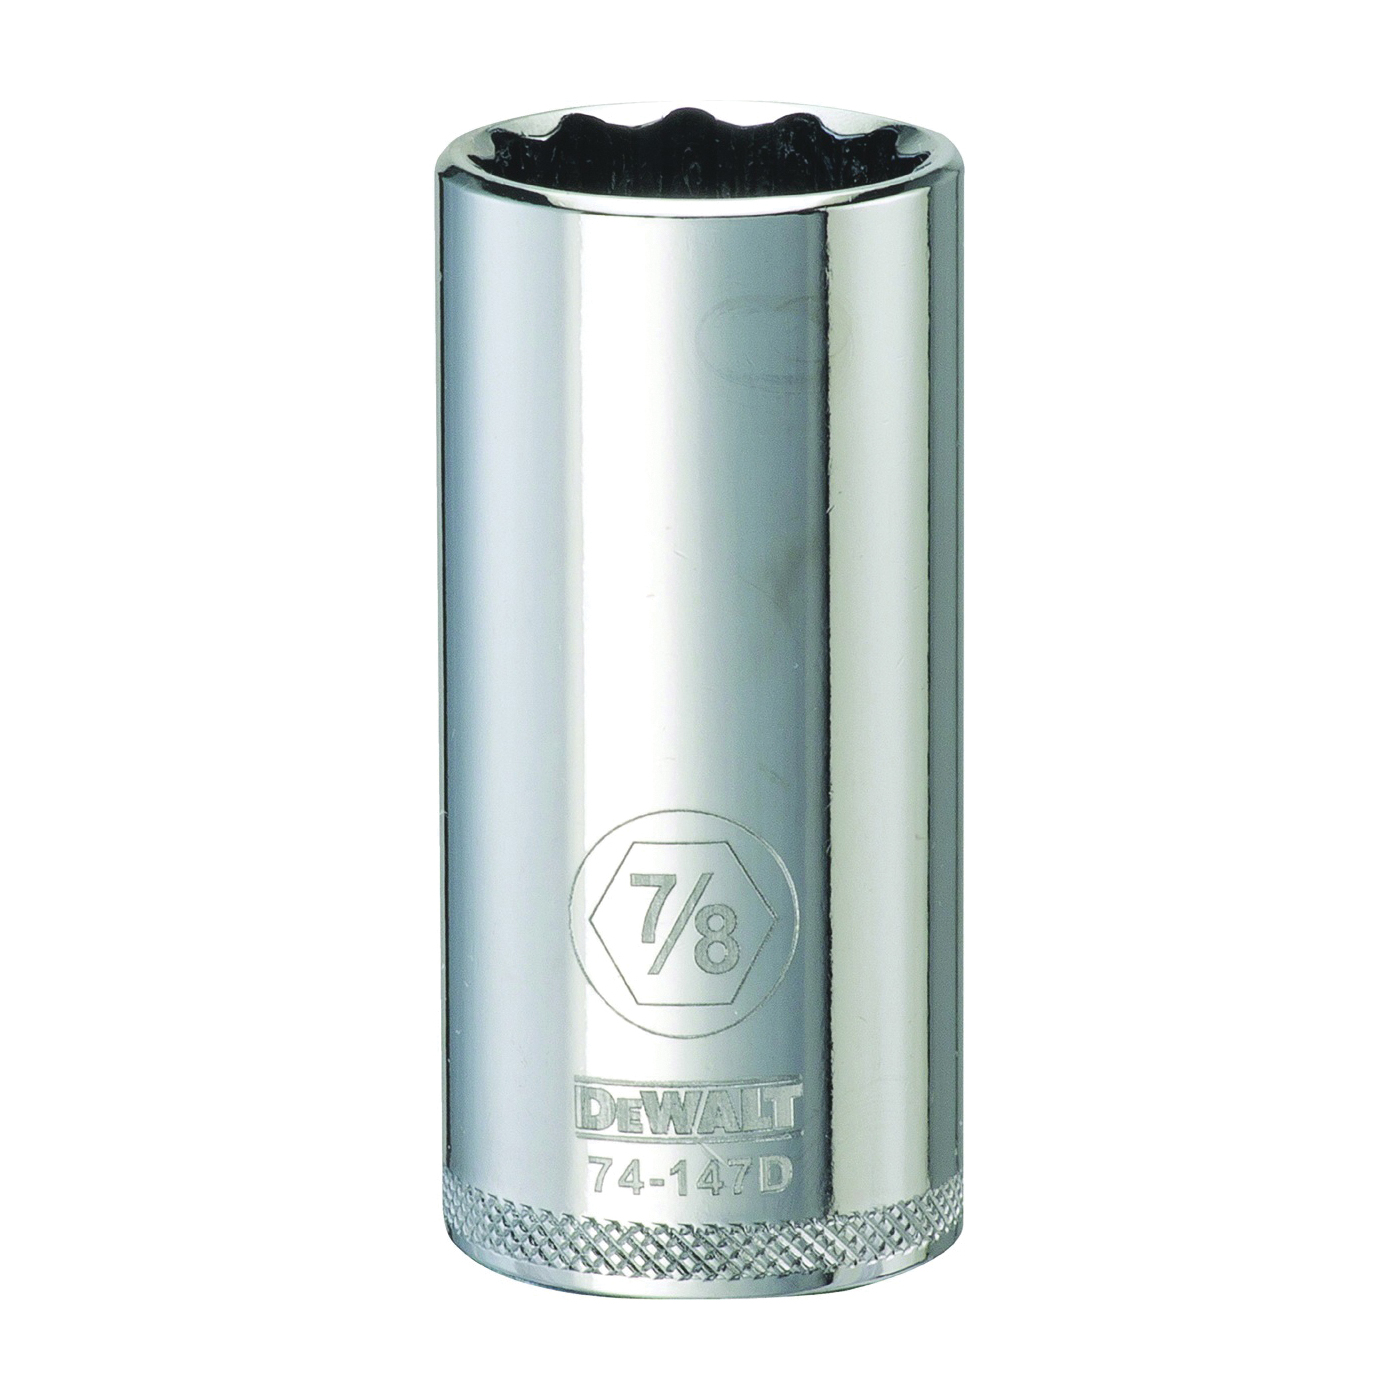 Picture of DeWALT DWMT74147OSP Drive Socket, 7/8 in Socket, 3/8 in Drive, 12 -Point, Vanadium Steel, Polished Chrome